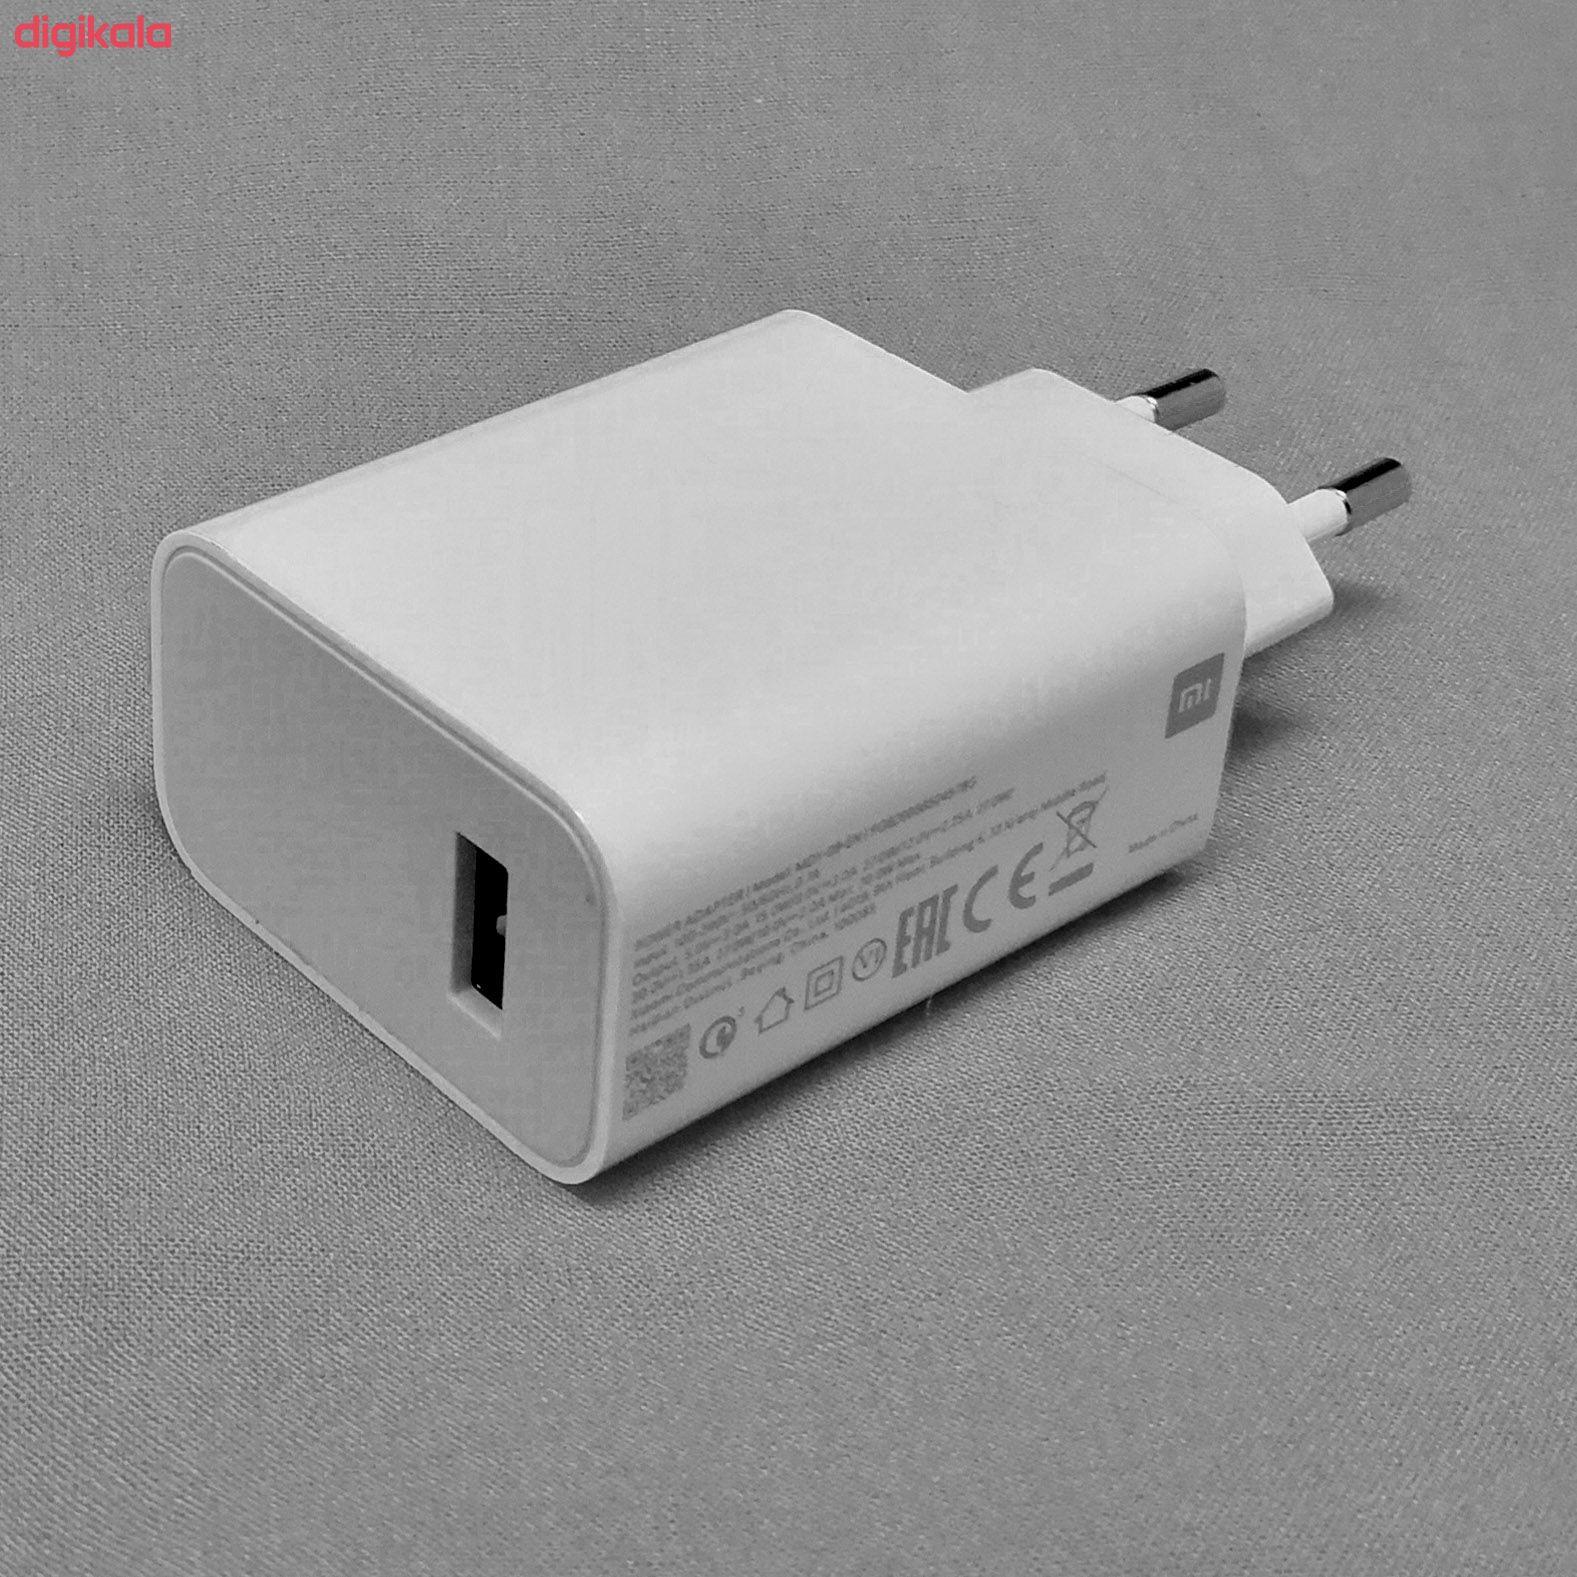 شارژر دیواری شیائومی مدل MDY-09-EN به همراه کابل تبدیل USB-C main 1 3